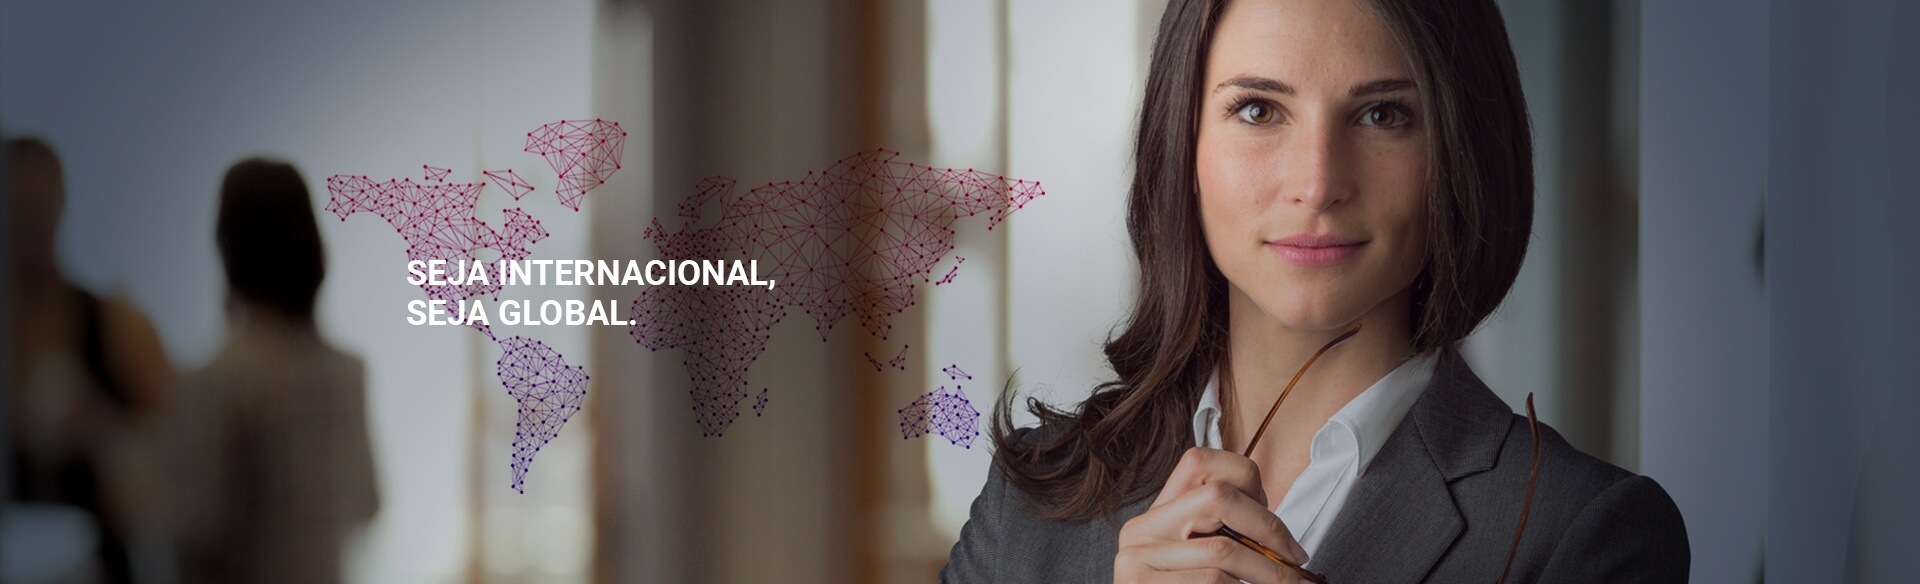 Seja Internacional, Seja Global - Global Assessoria